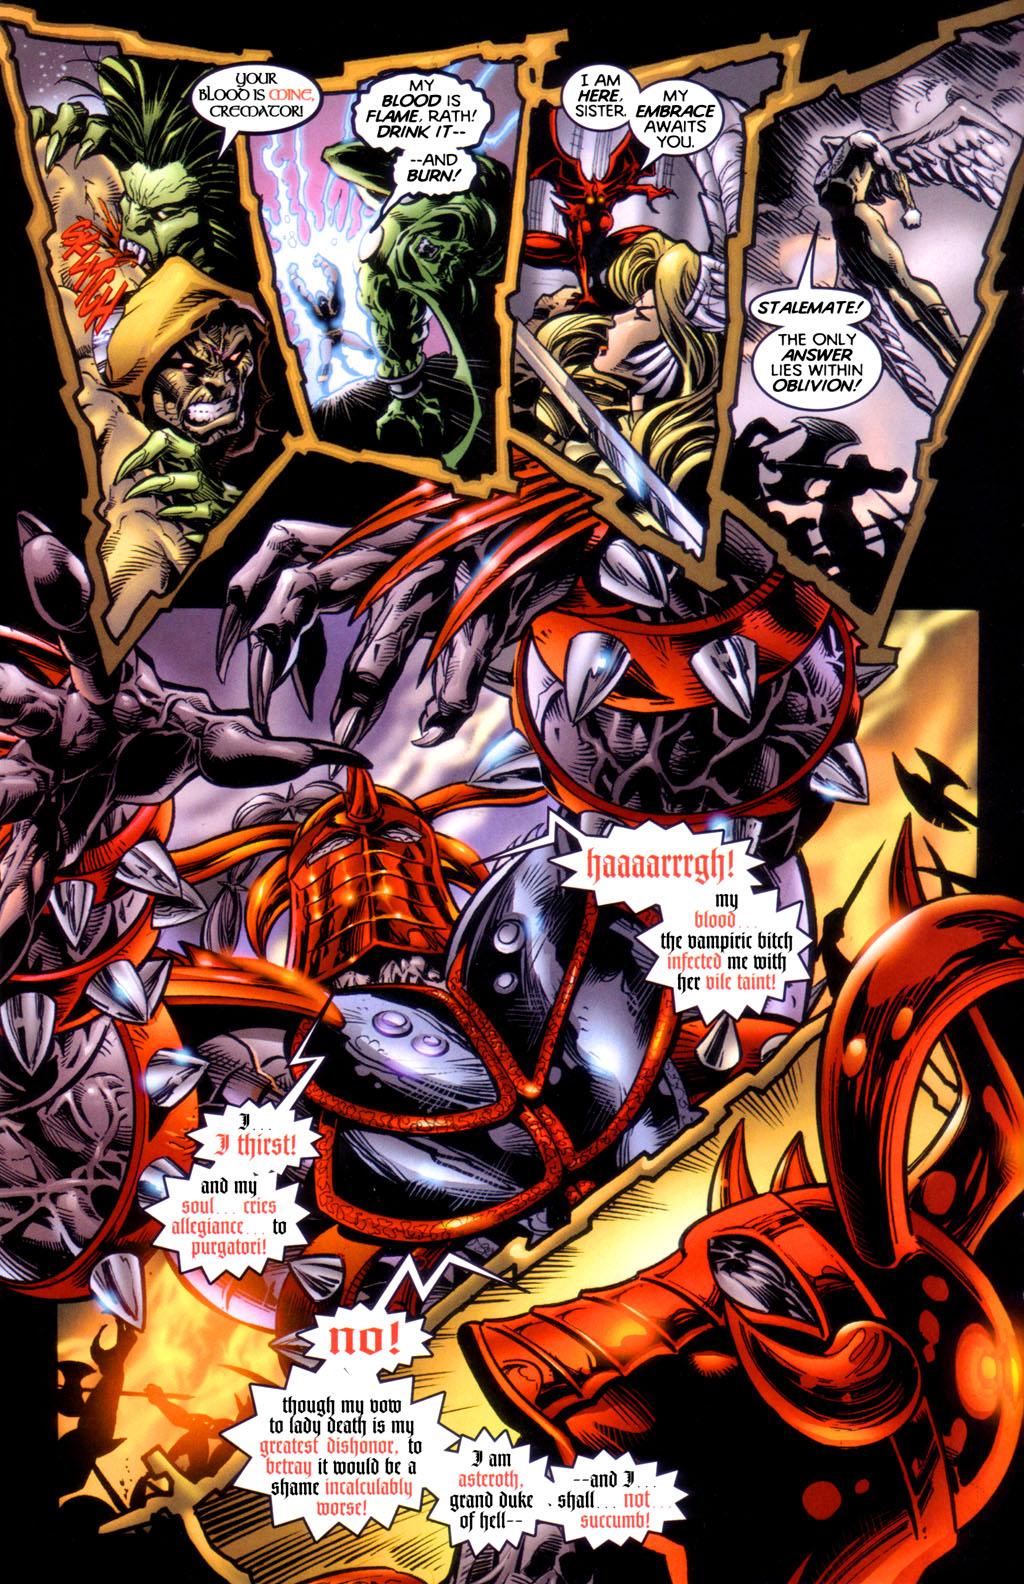 Read online Lady Death vs. Purgatori comic -  Issue # Full - 12